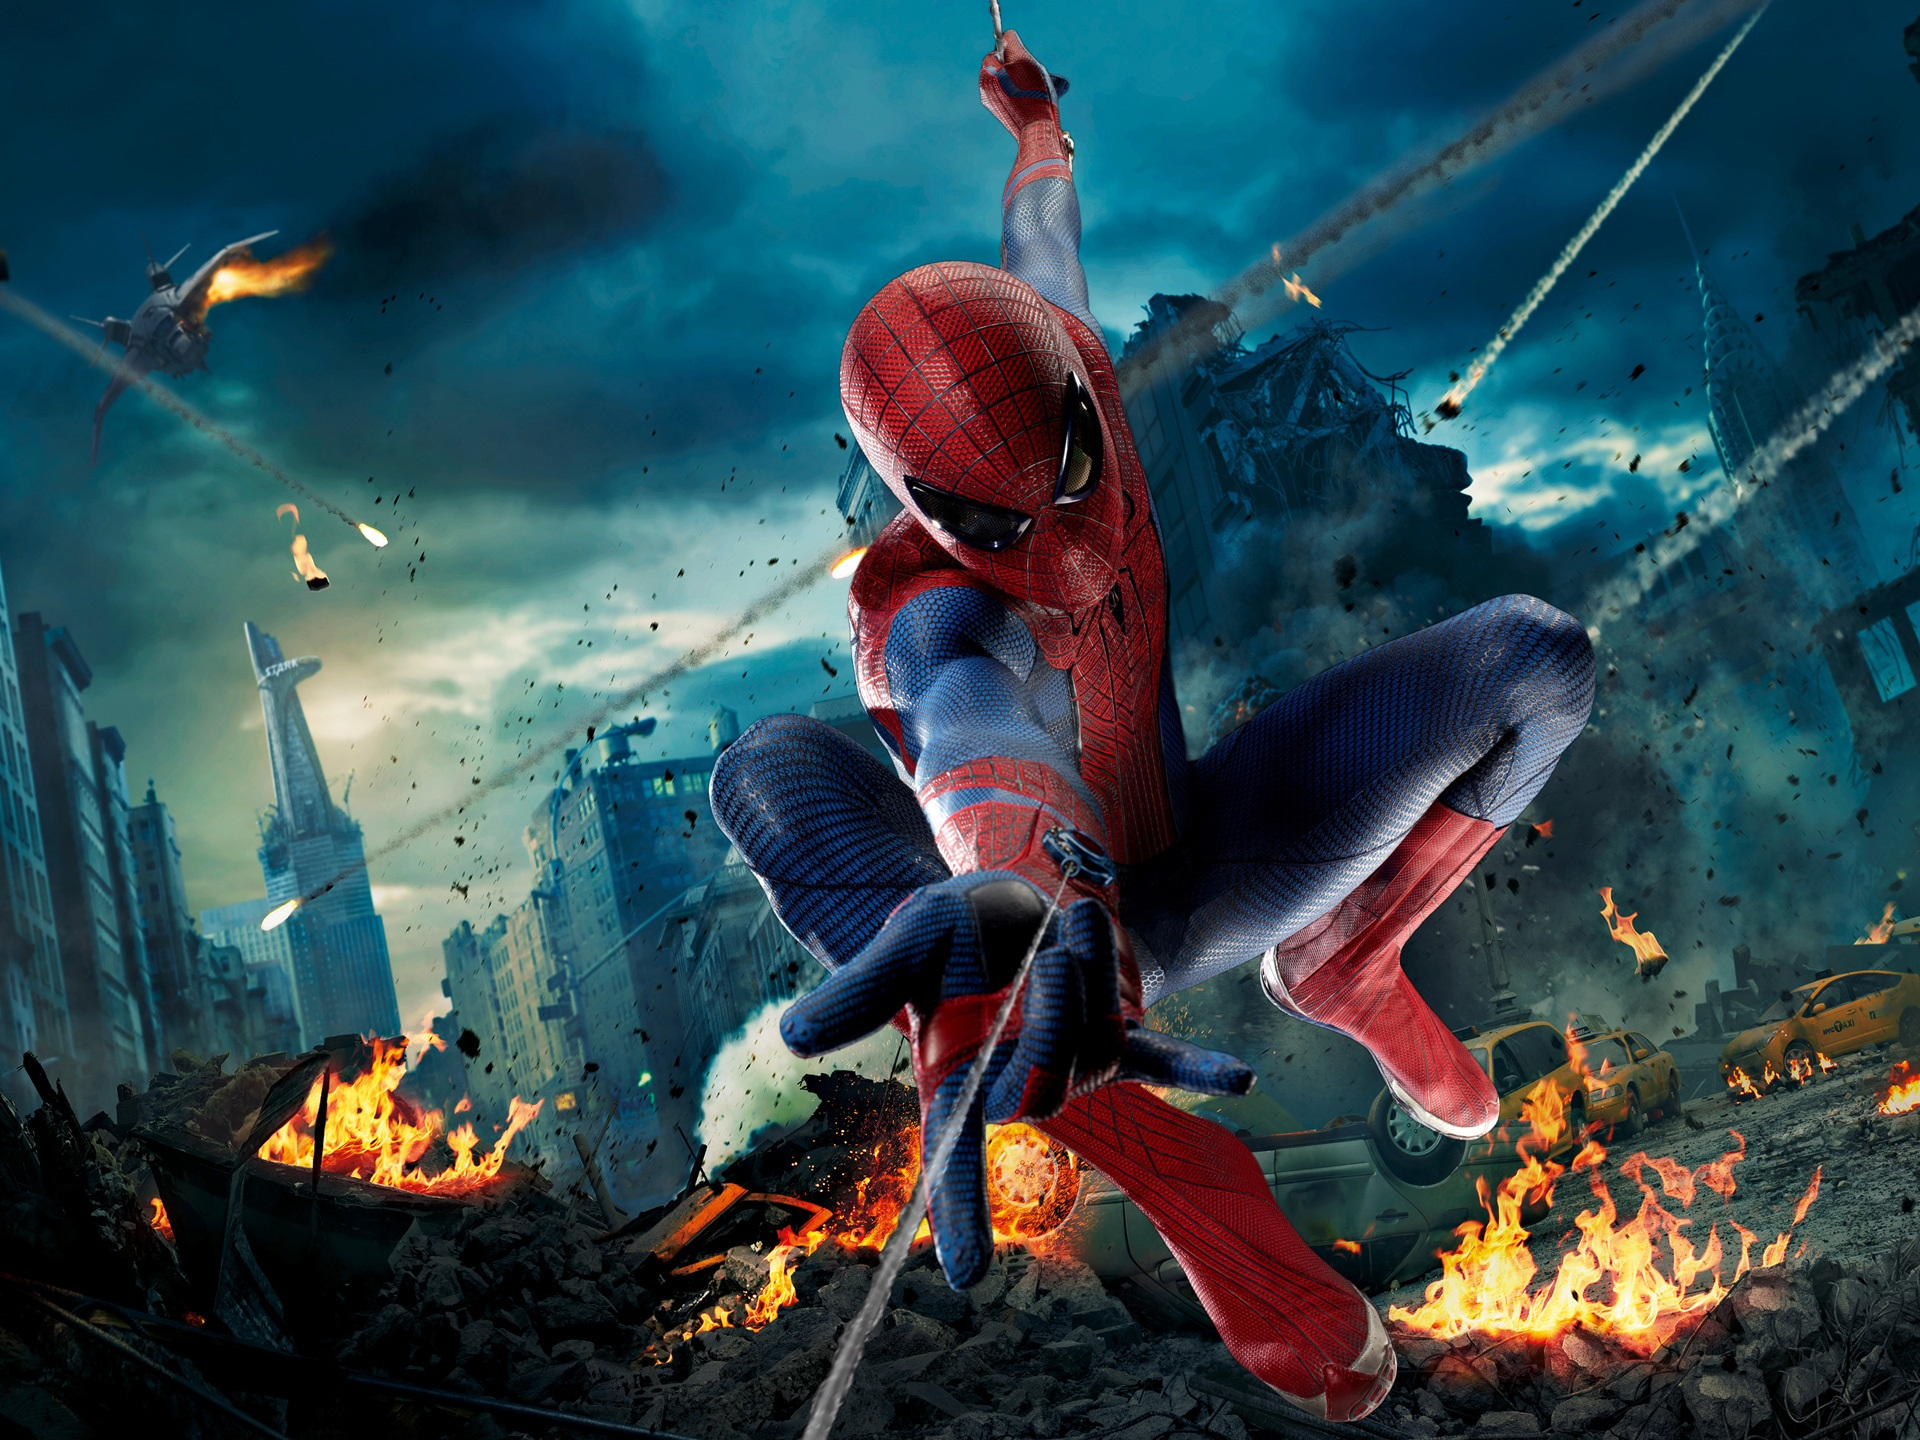 Fonds d 39 cran the avengers spider man 2560x1440 qhd image for Fond ecran qhd